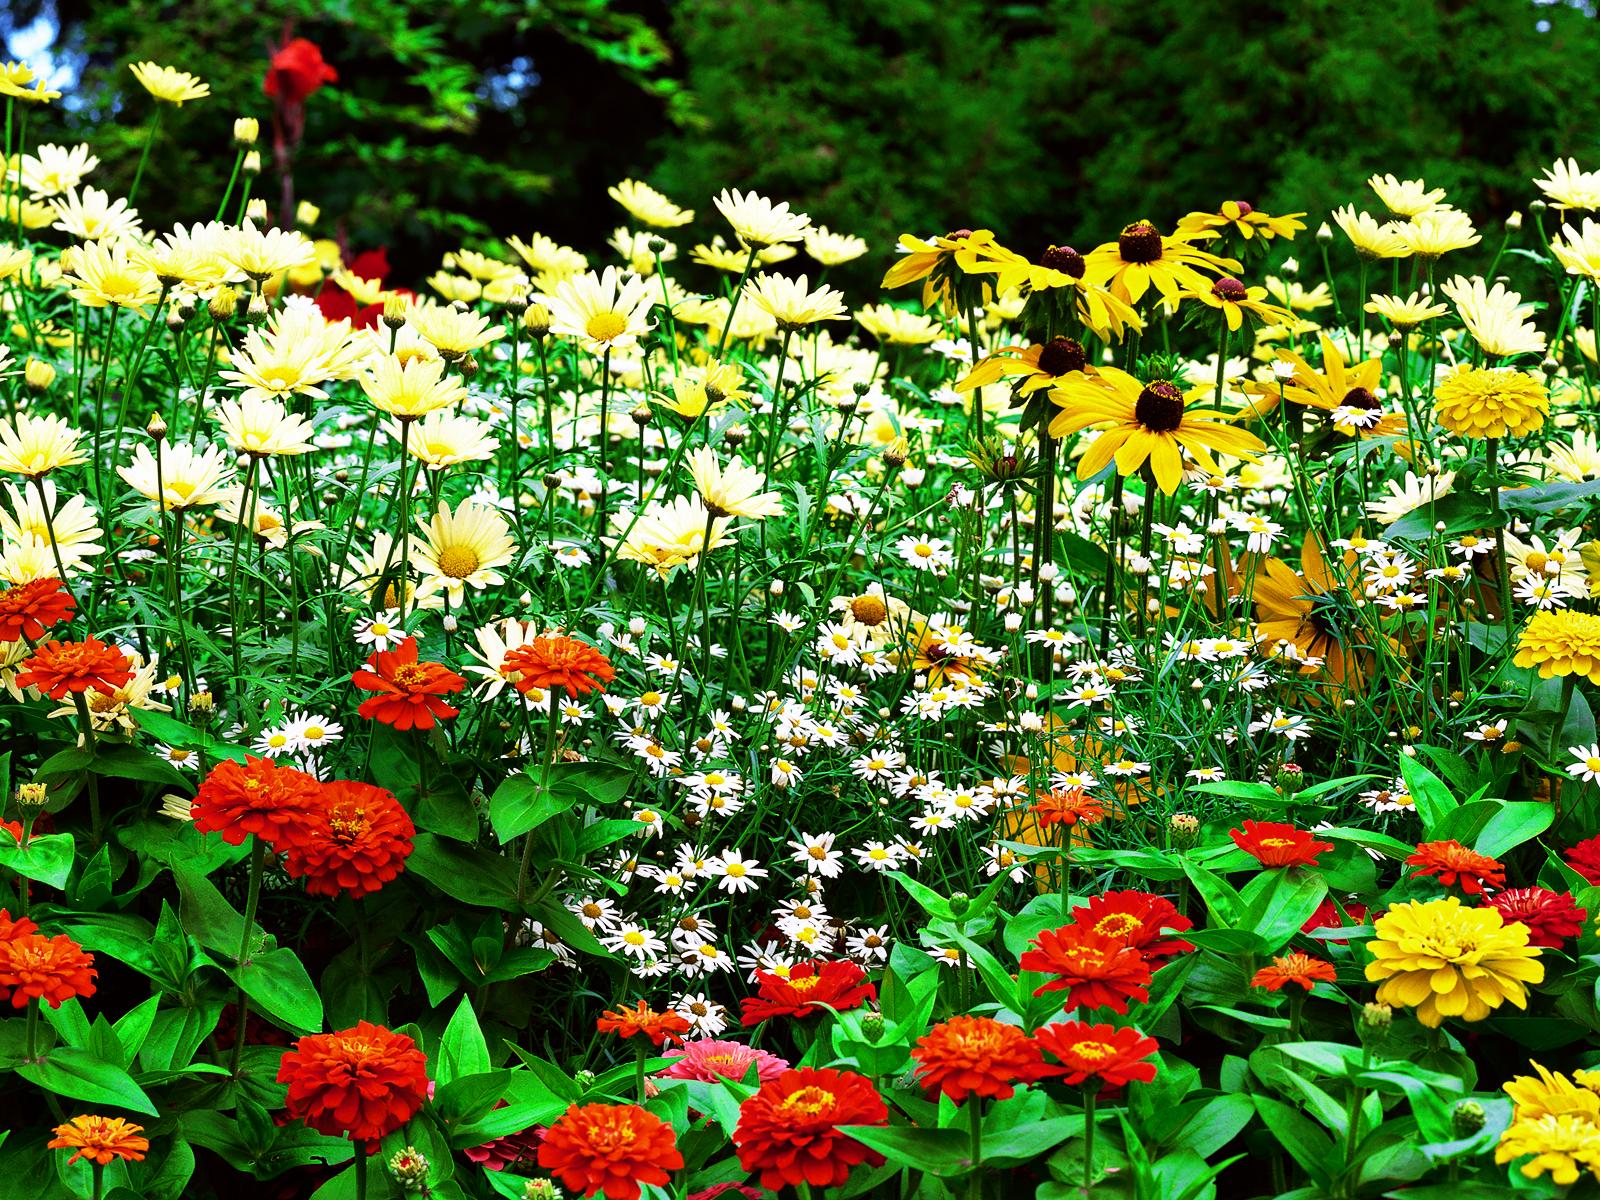 Flower garden wallpaper background - Wallpapers Dekstop 4 U Flower Garden Wallpaper